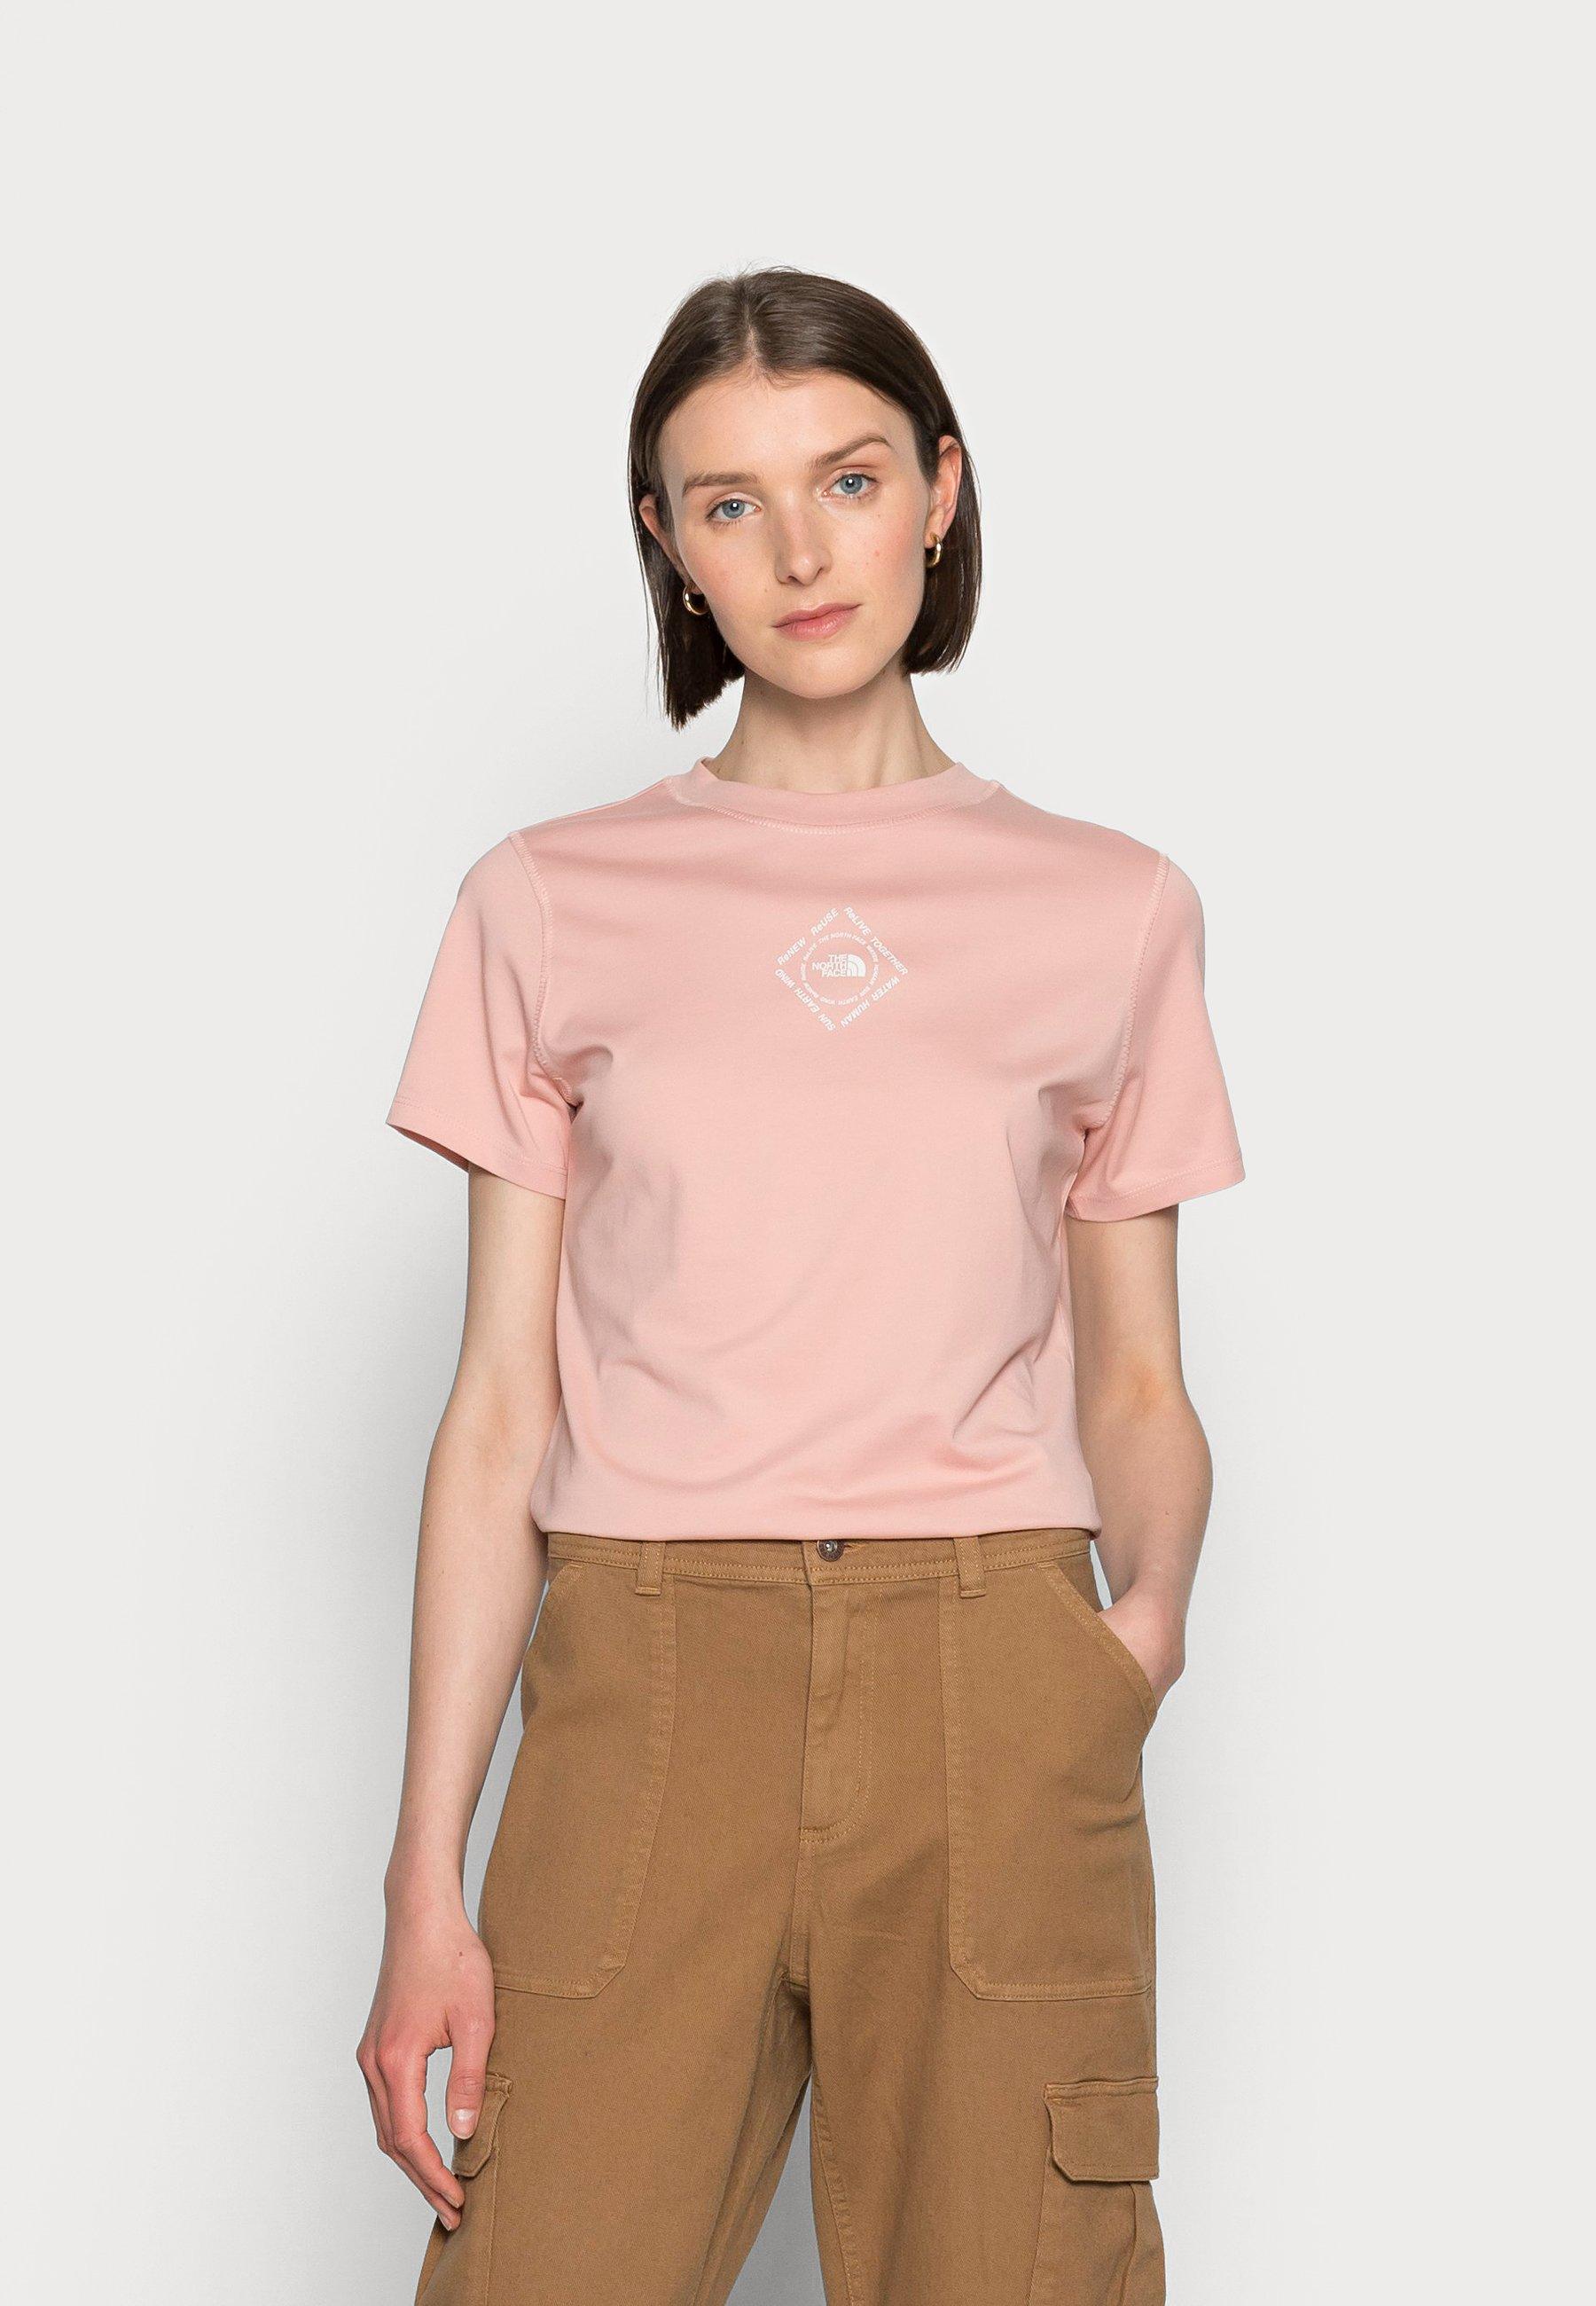 Femme HERITAGE CARGO PANT - Pantalon cargo